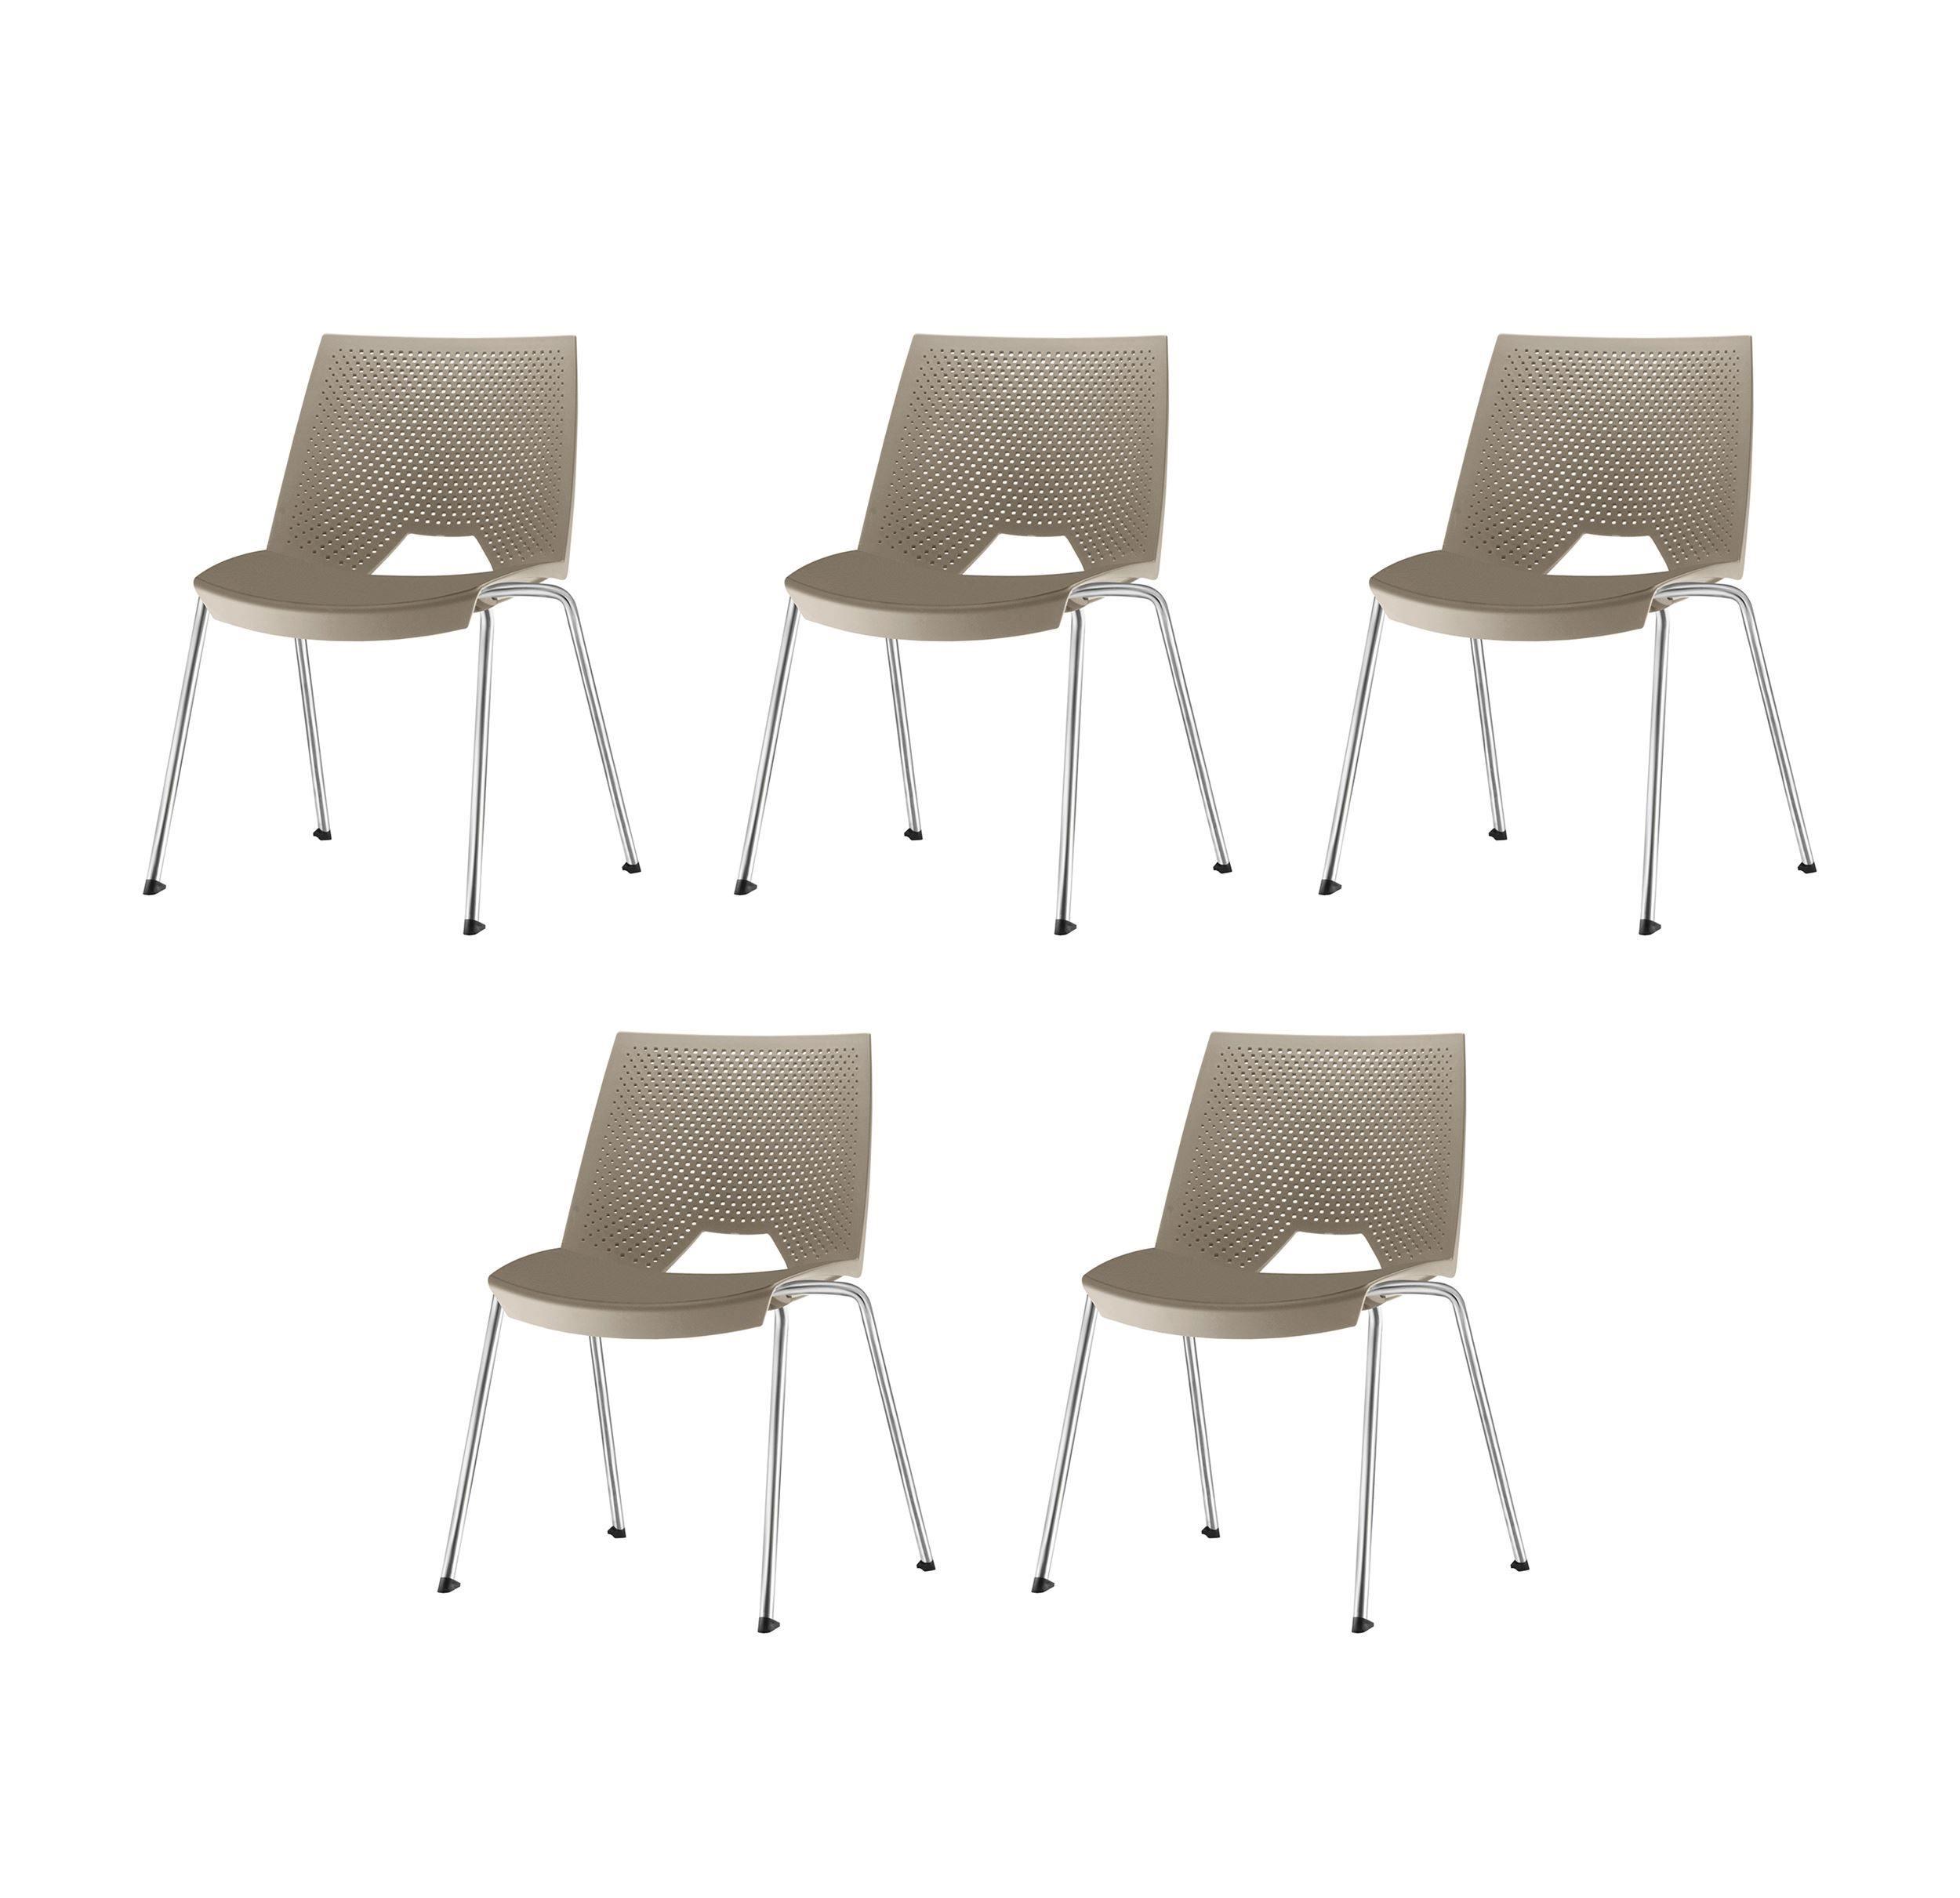 Kit 5 Cadeiras Strike Assento Bege Base Cromada - 57641